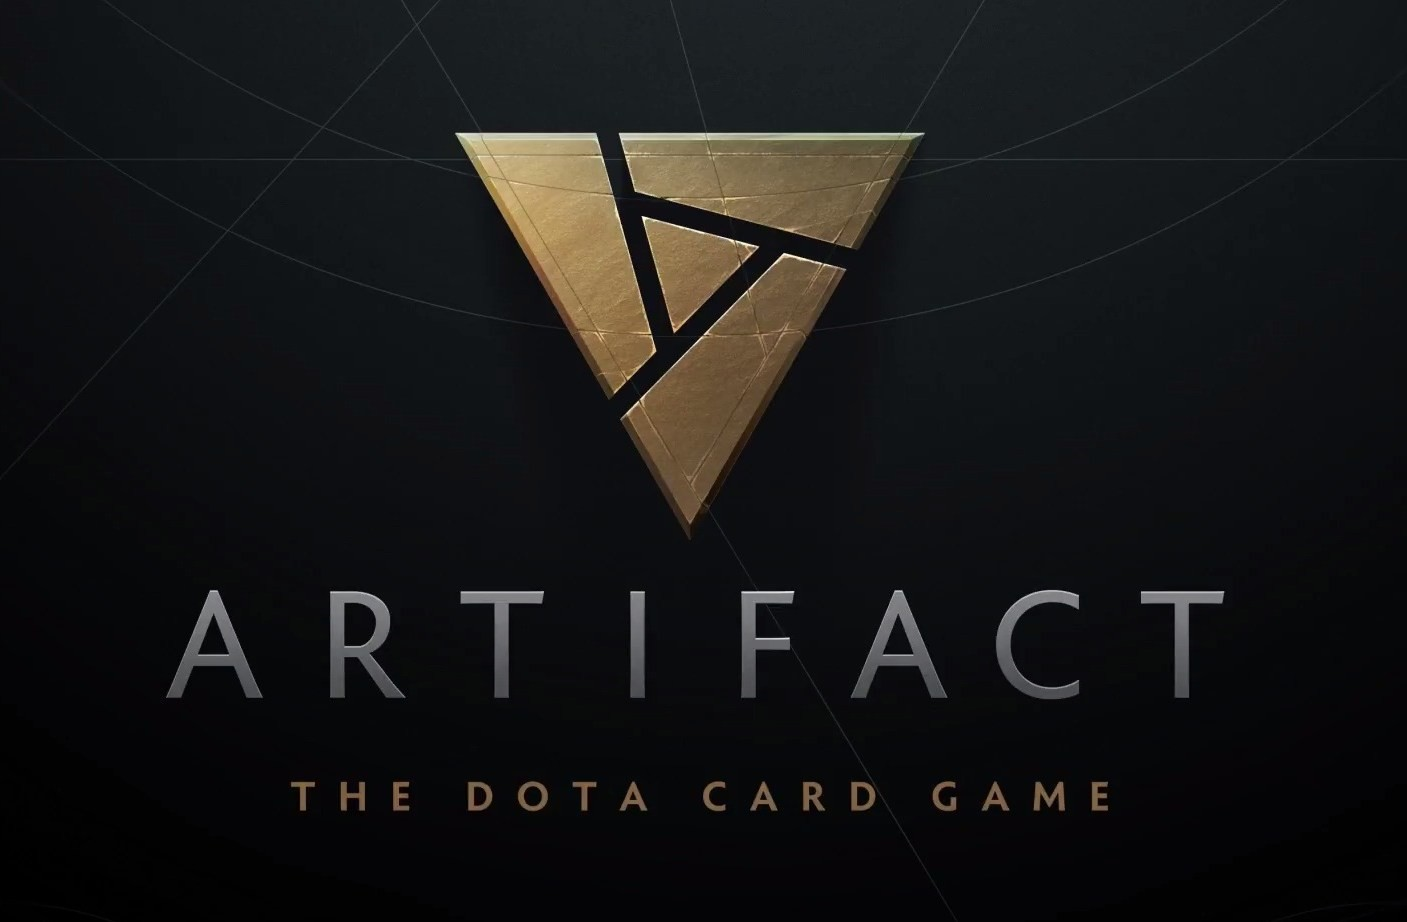 《Artifact》开发者:并不会与《炉石传说》直接竞争